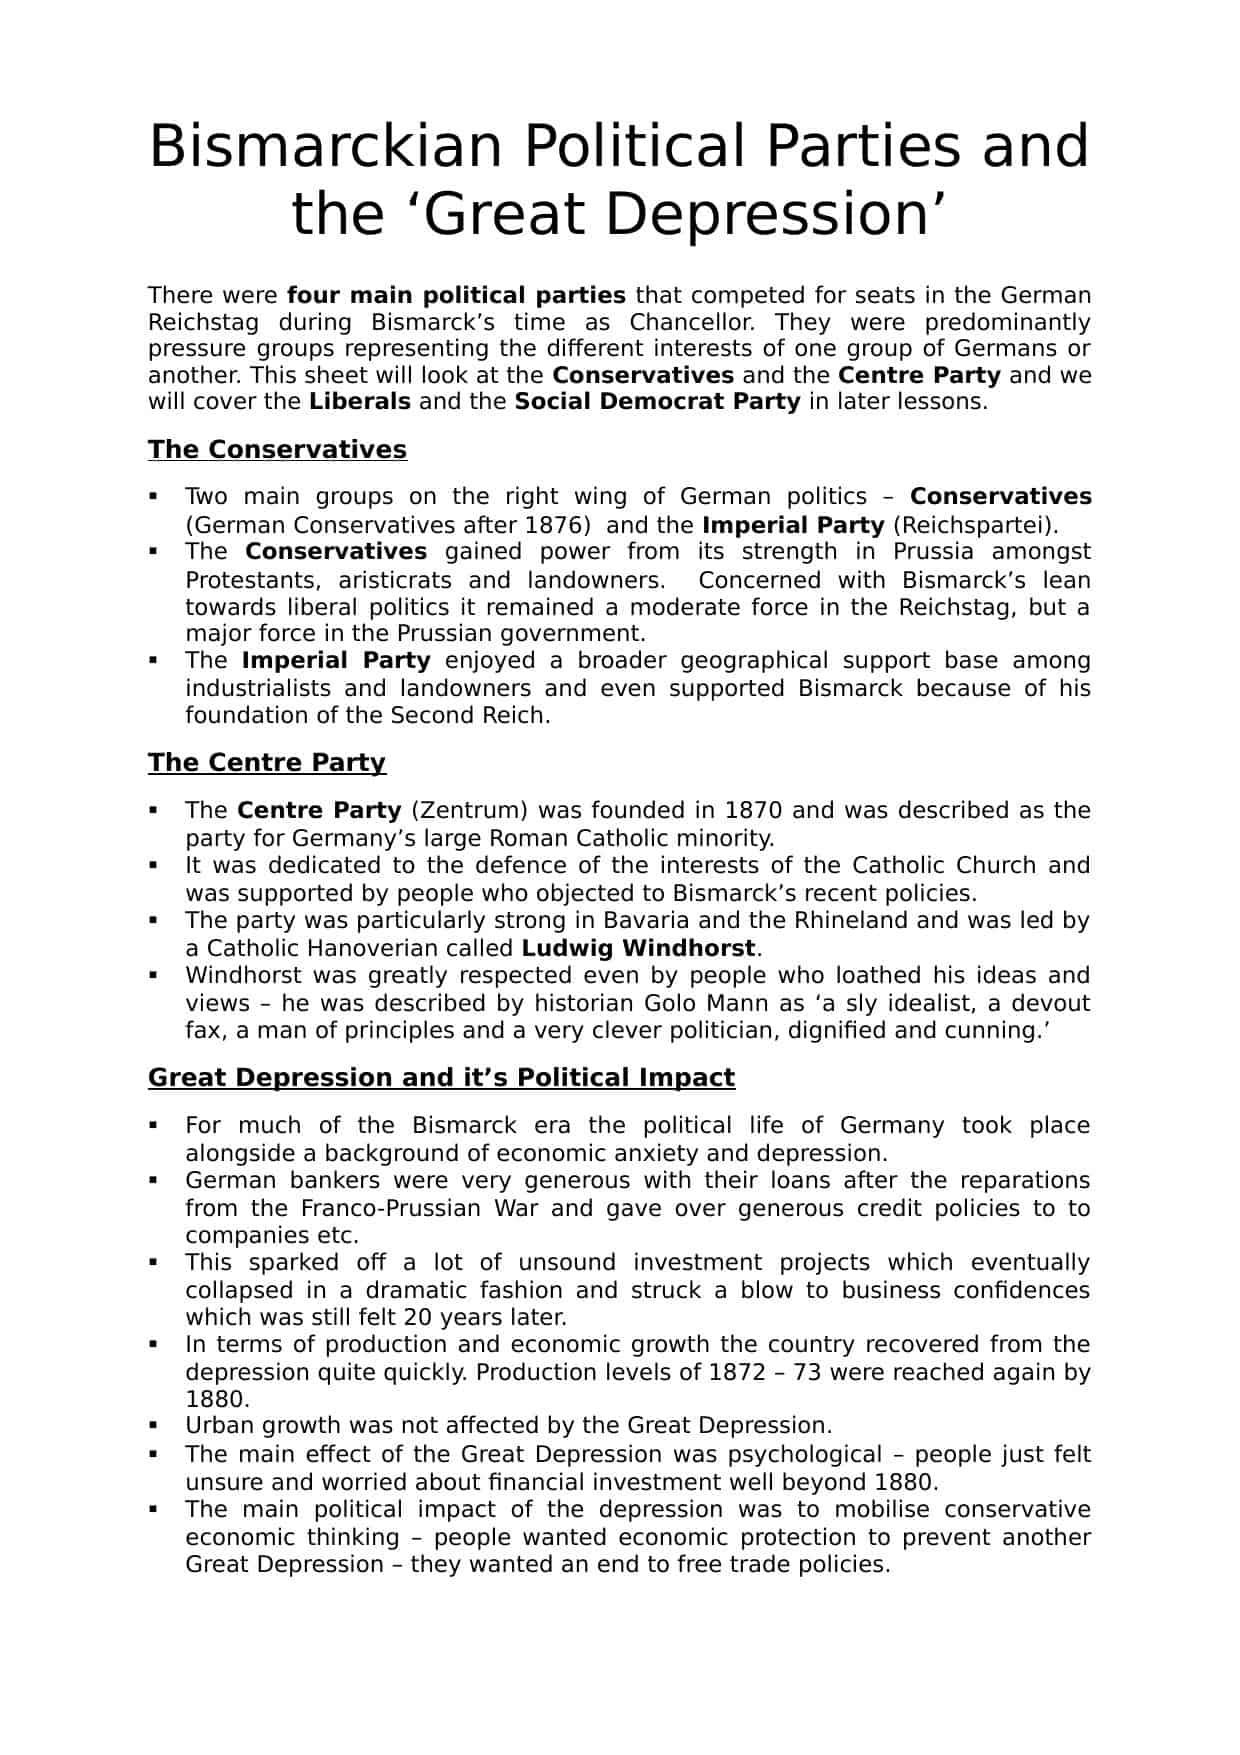 Worksheet On Political Parties